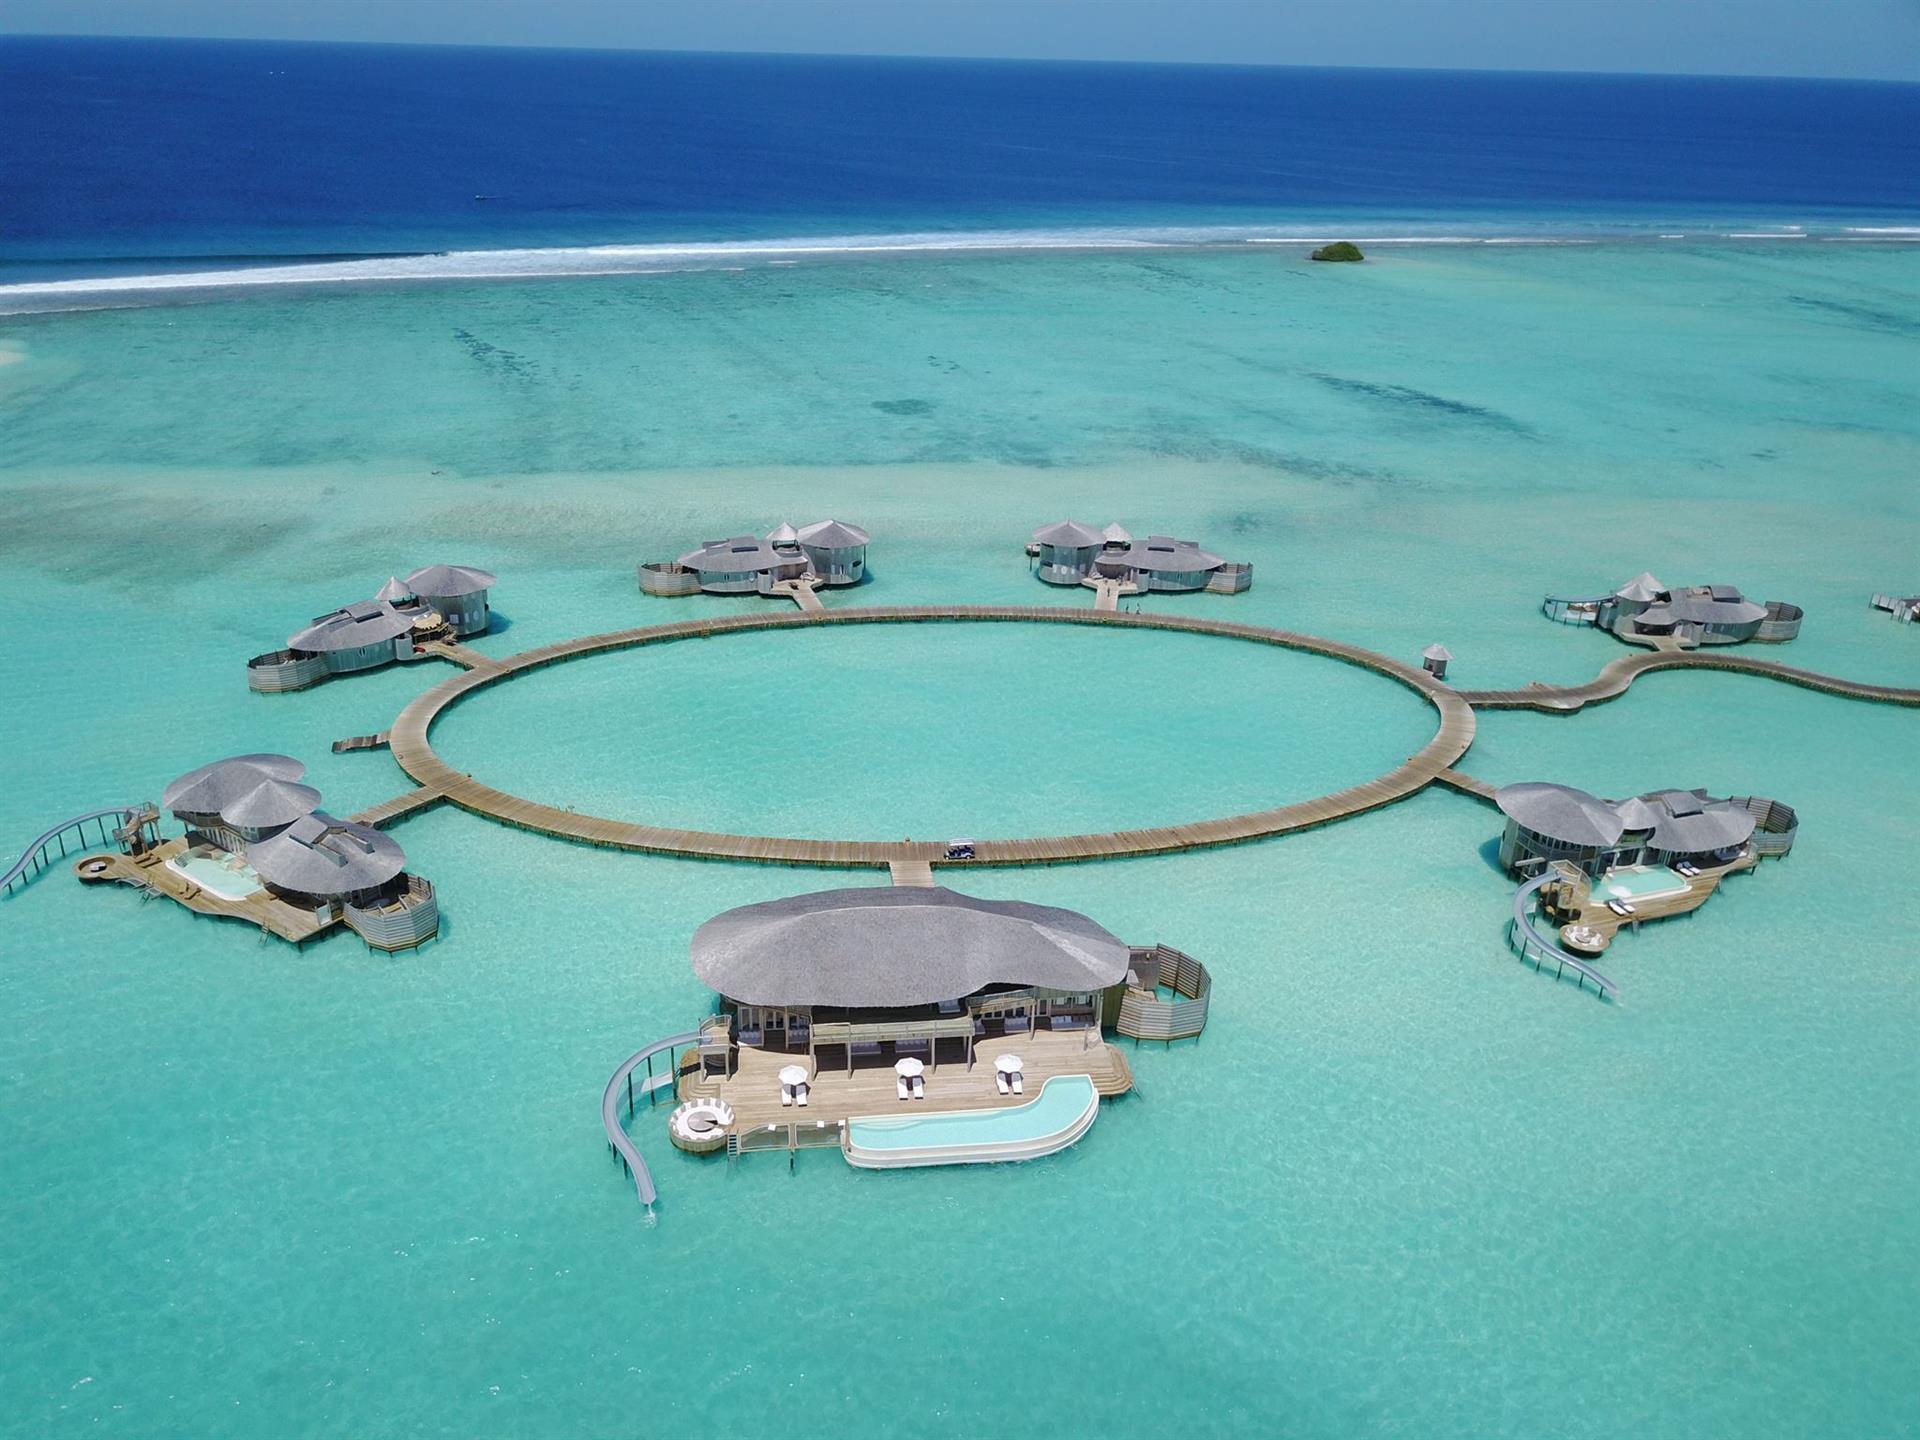 tur na maldivy male 67 955 rub chel - Тур на Мальдивы Мале 67 955 руб. чел.